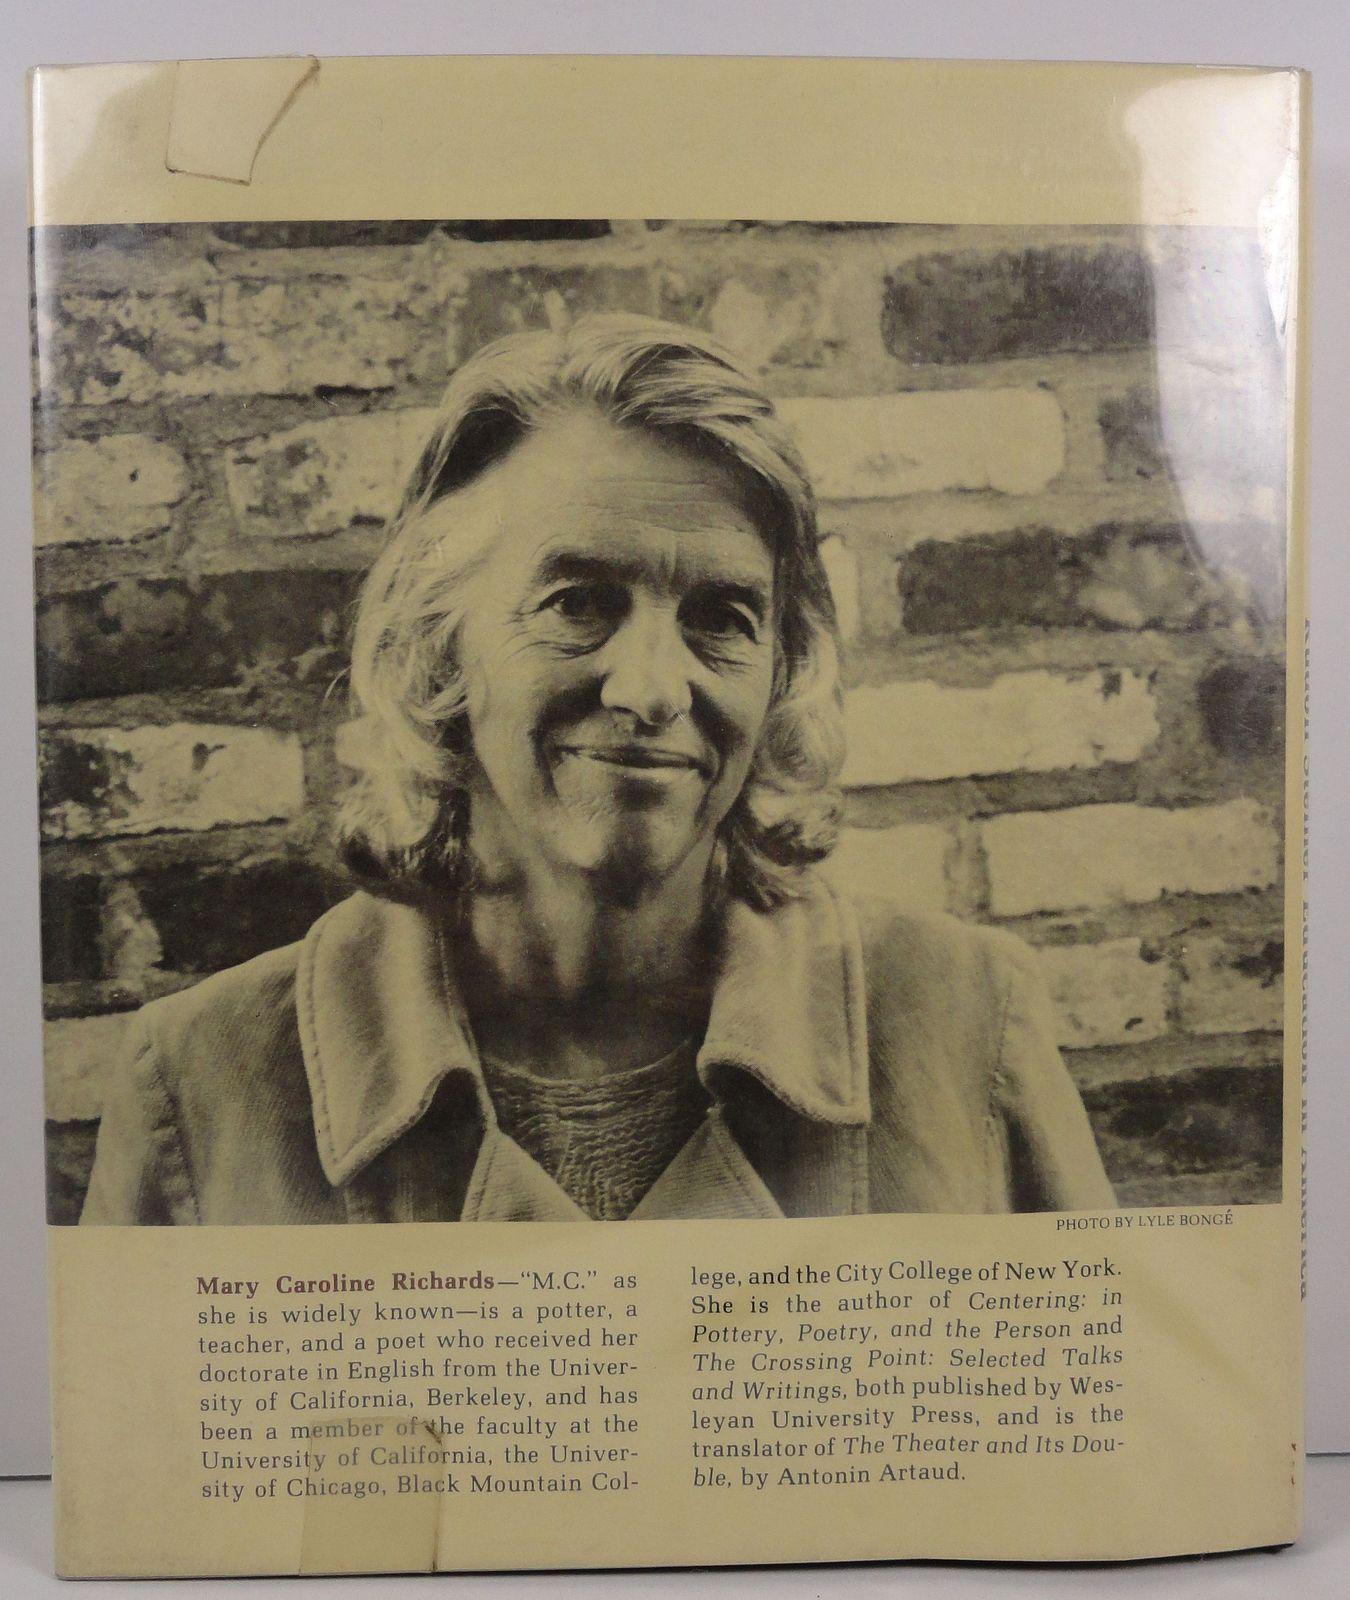 Toward Wholeness Rudolf Steiner Education Mary C. Richards